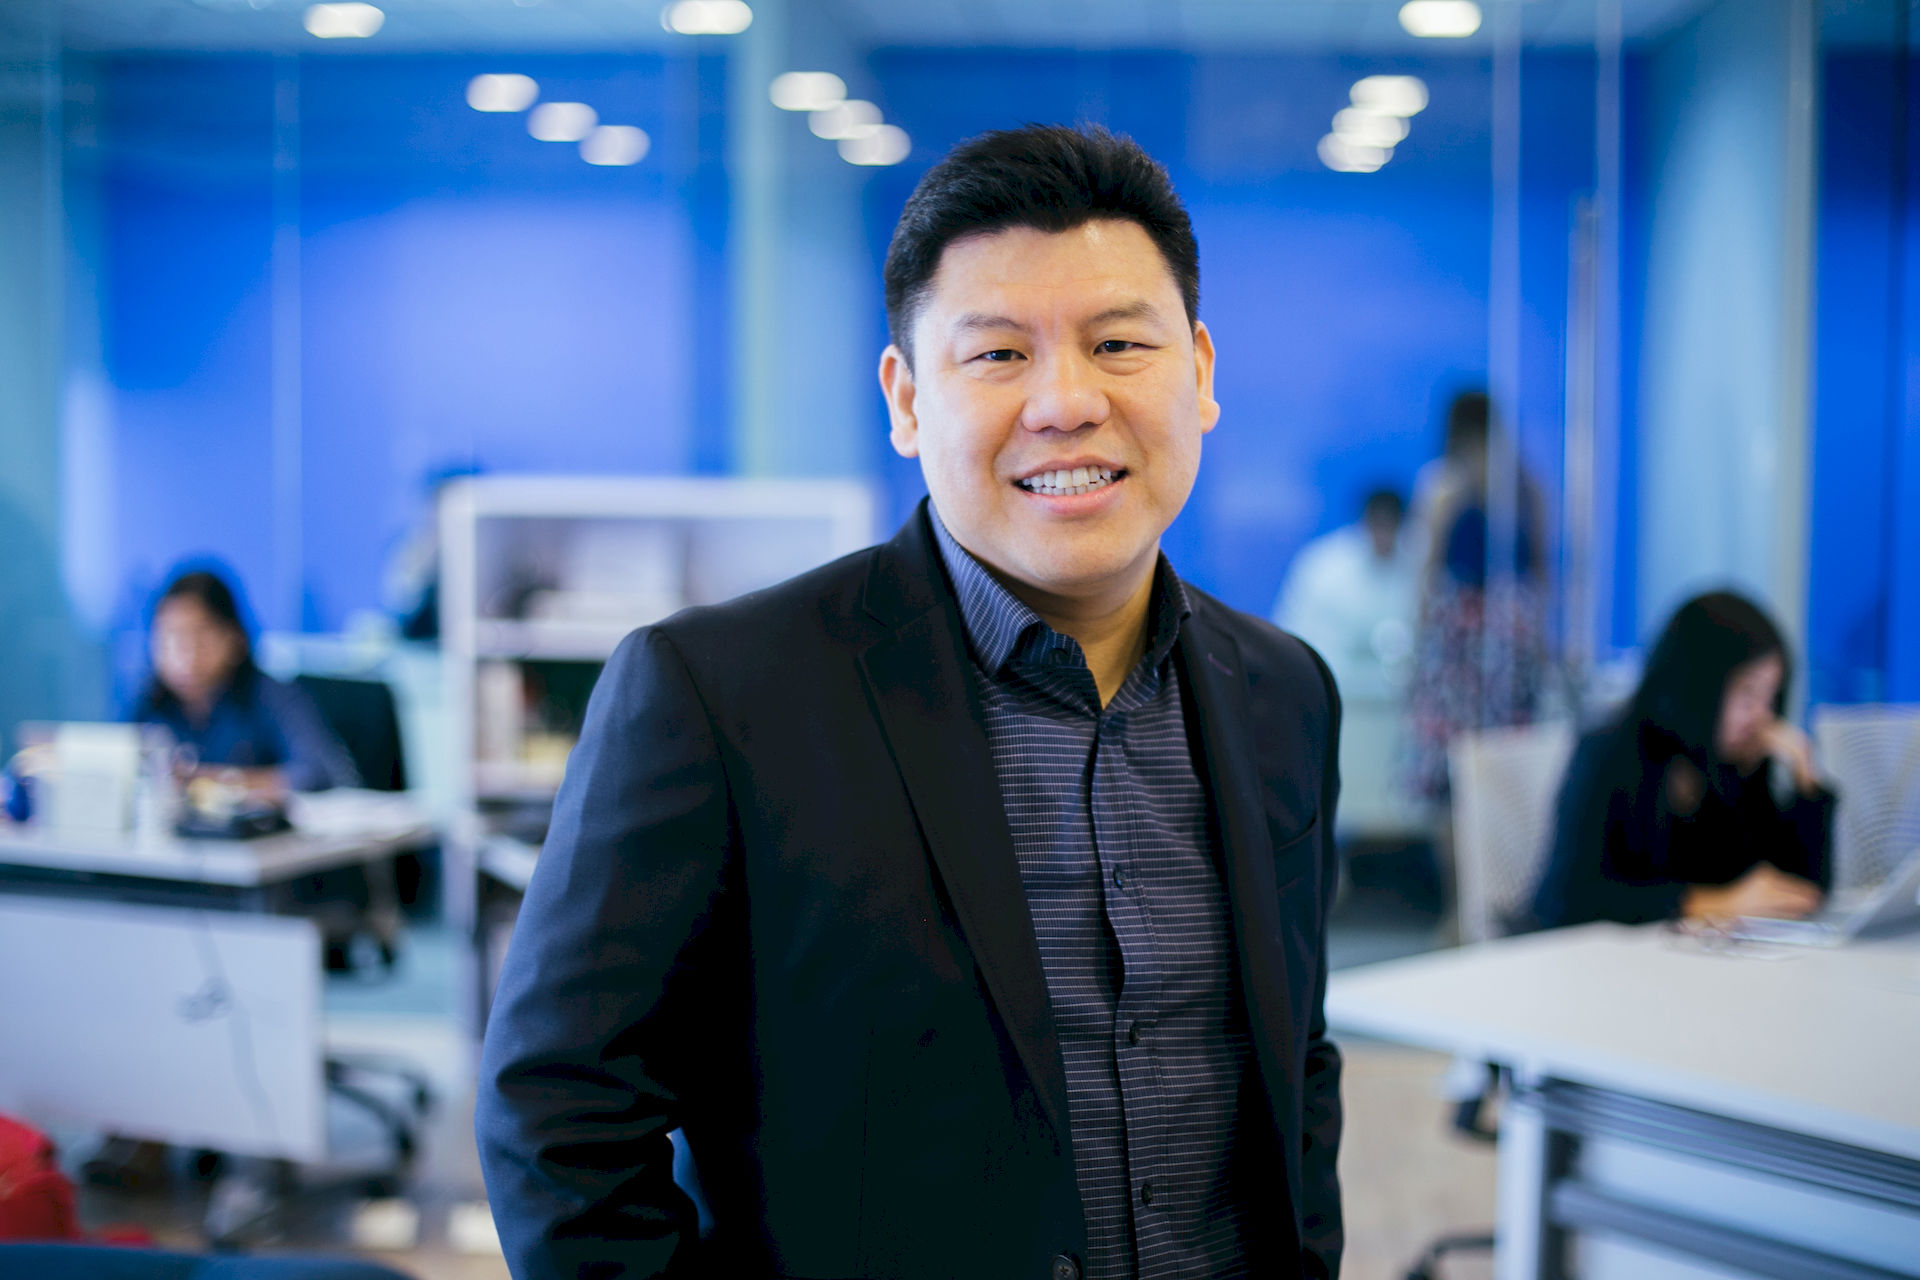 Photo of Winston Damarillo: CEO/Founder of Morphlabs and Filipino entrepreneur